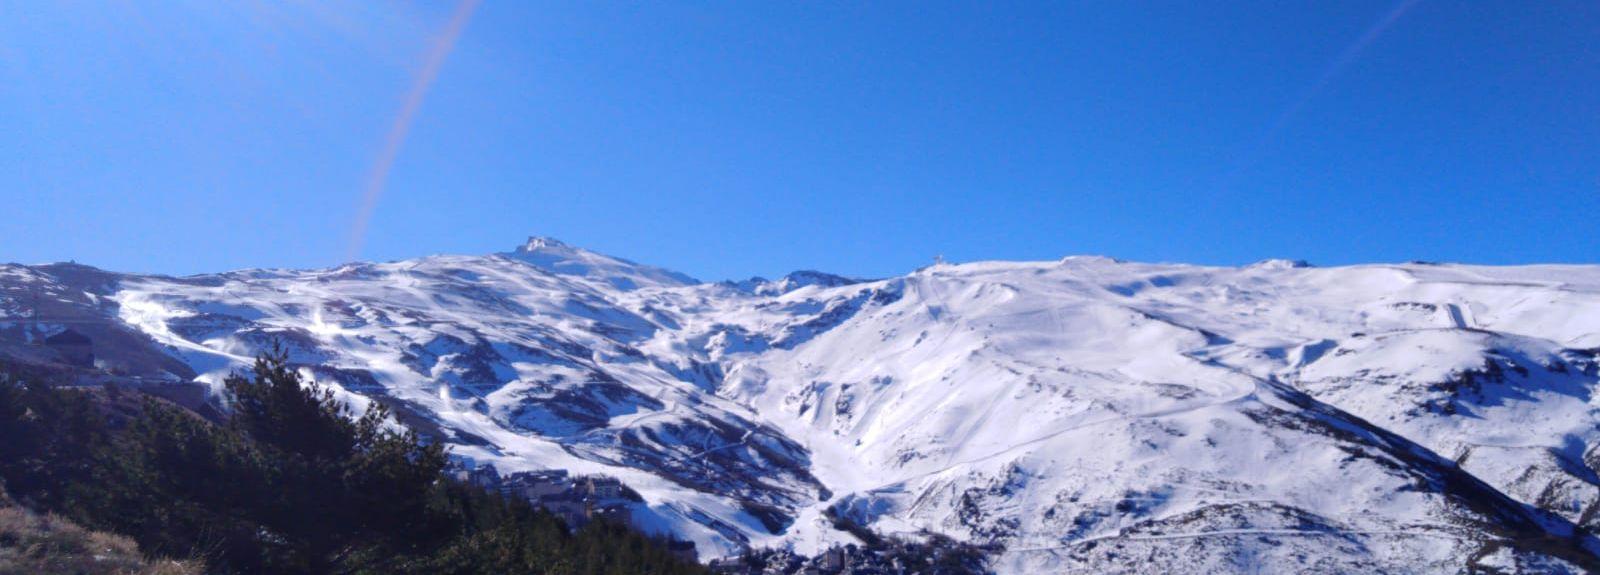 Sierra Nevada Ski Resort, Monachil, Andalusia, Spain